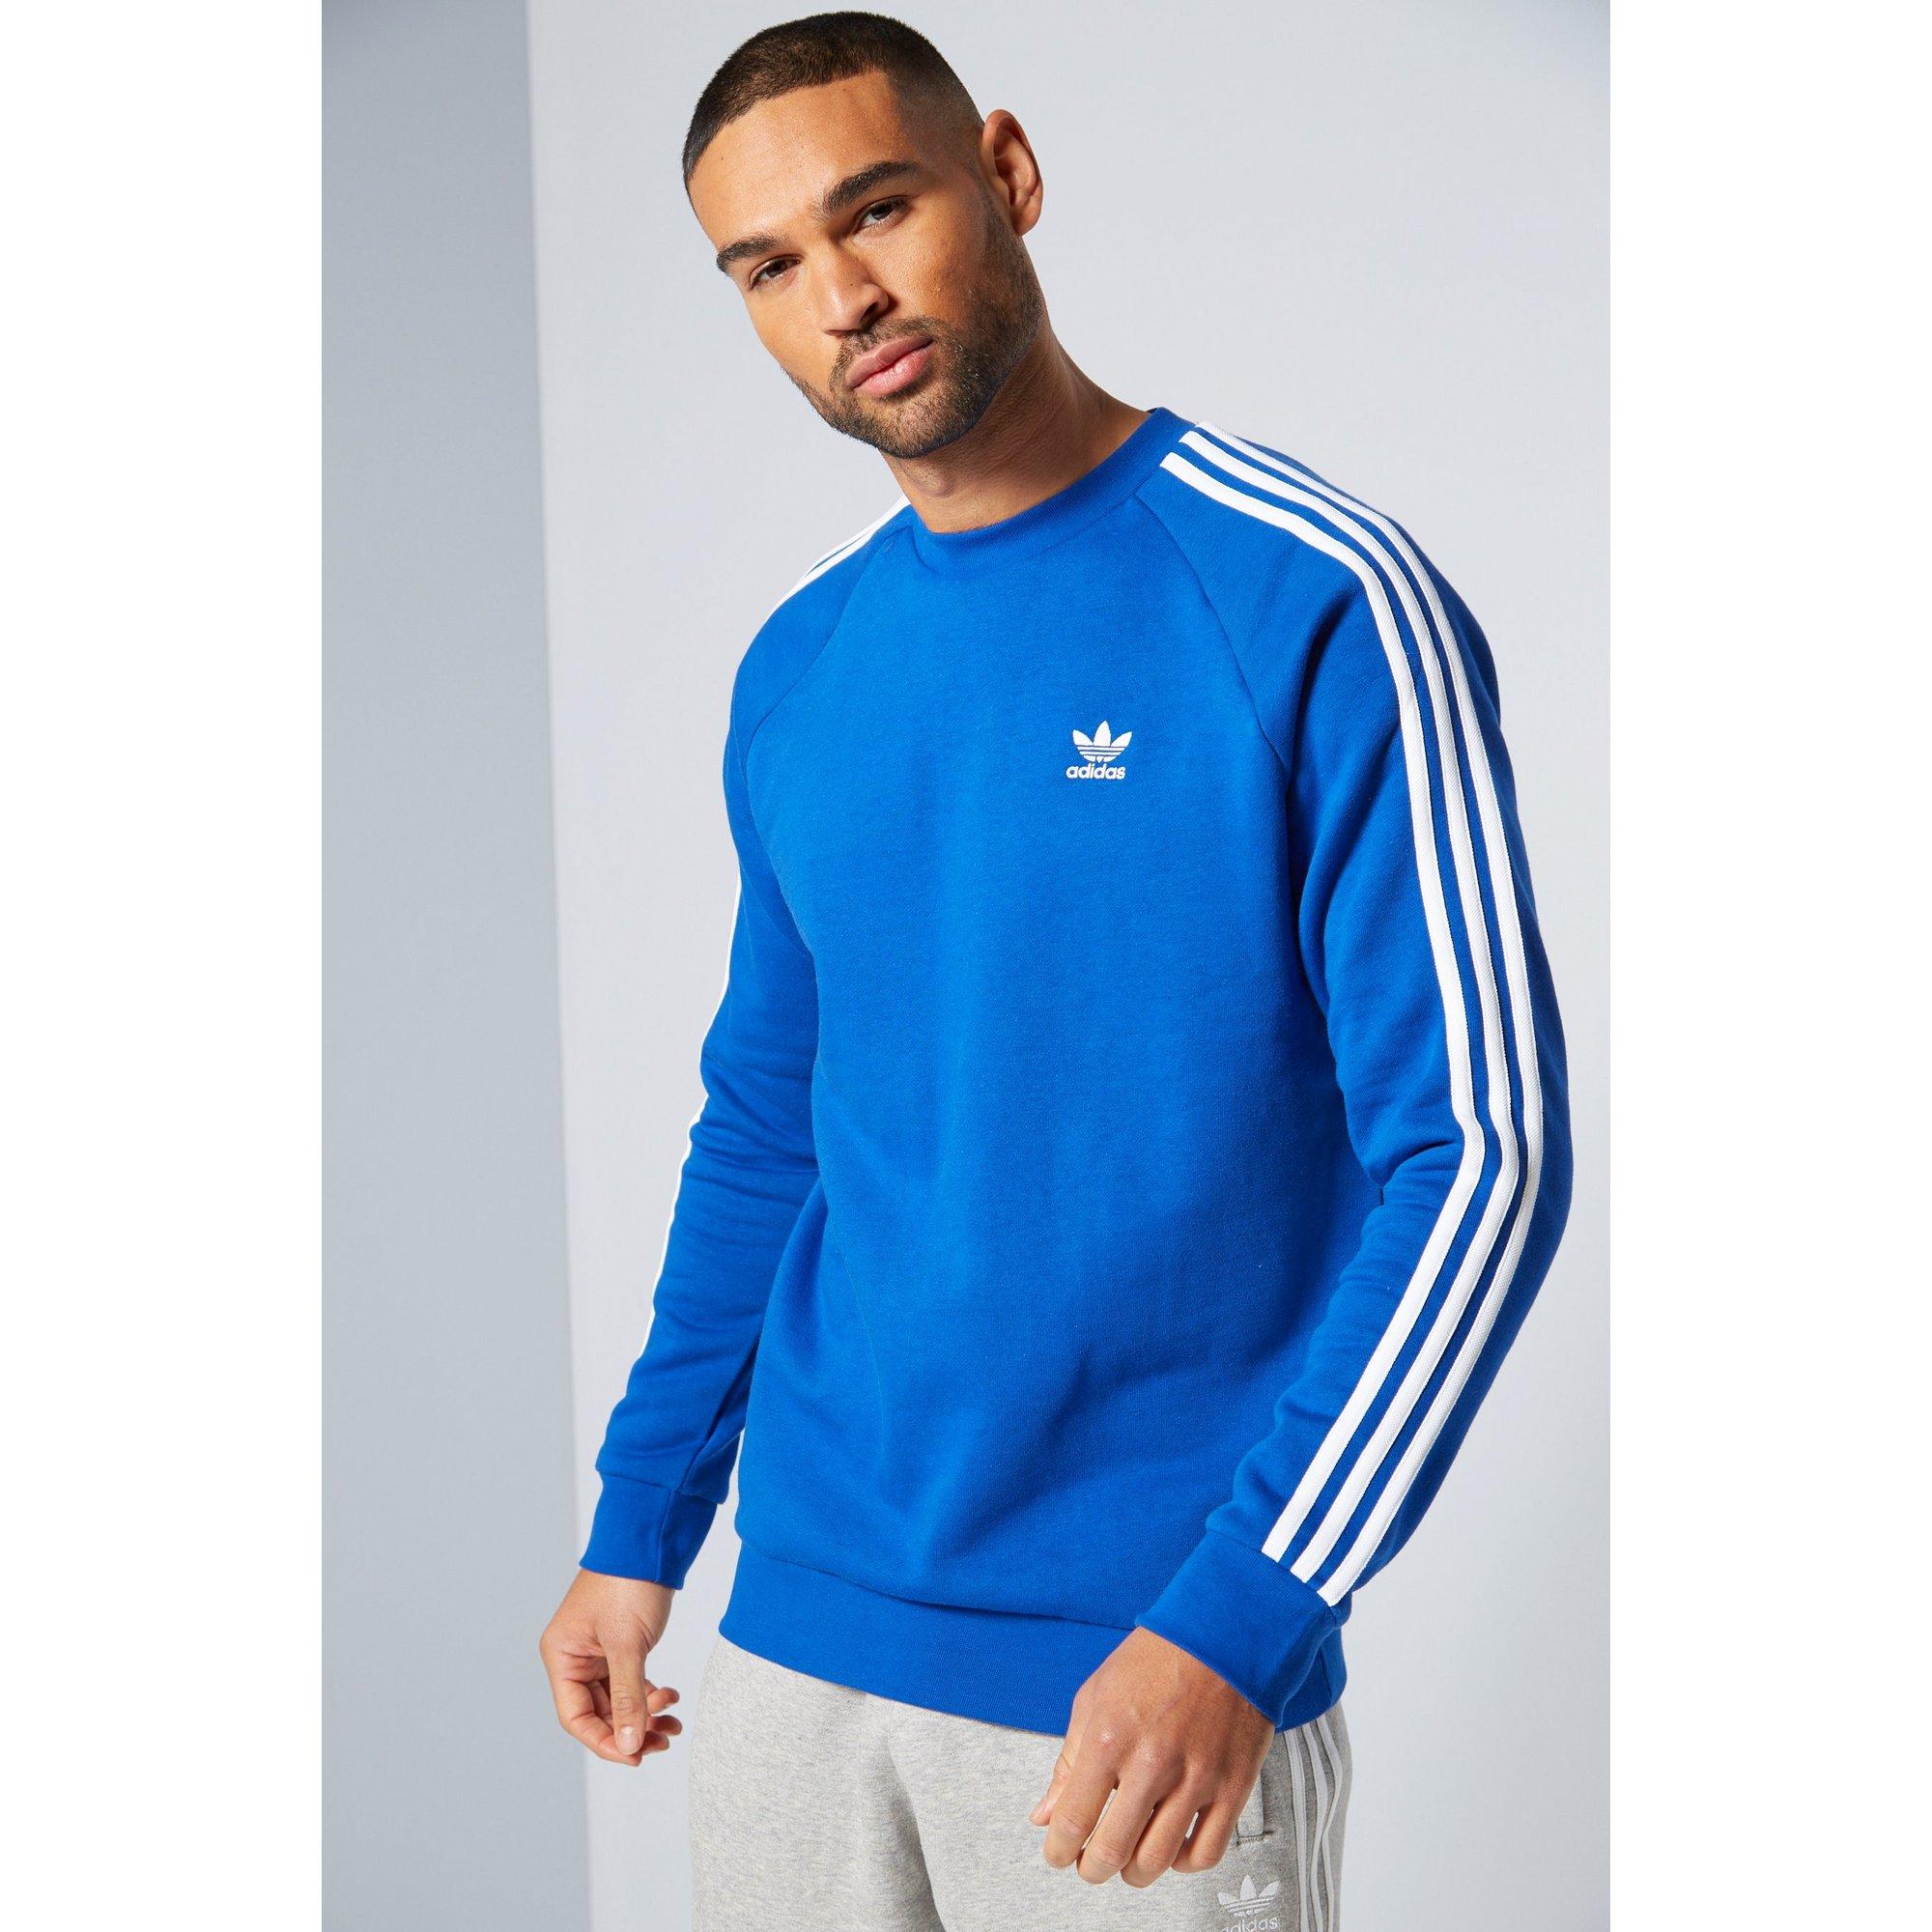 Image of adidas Originals 3 Stripe Crew Sweatshirt